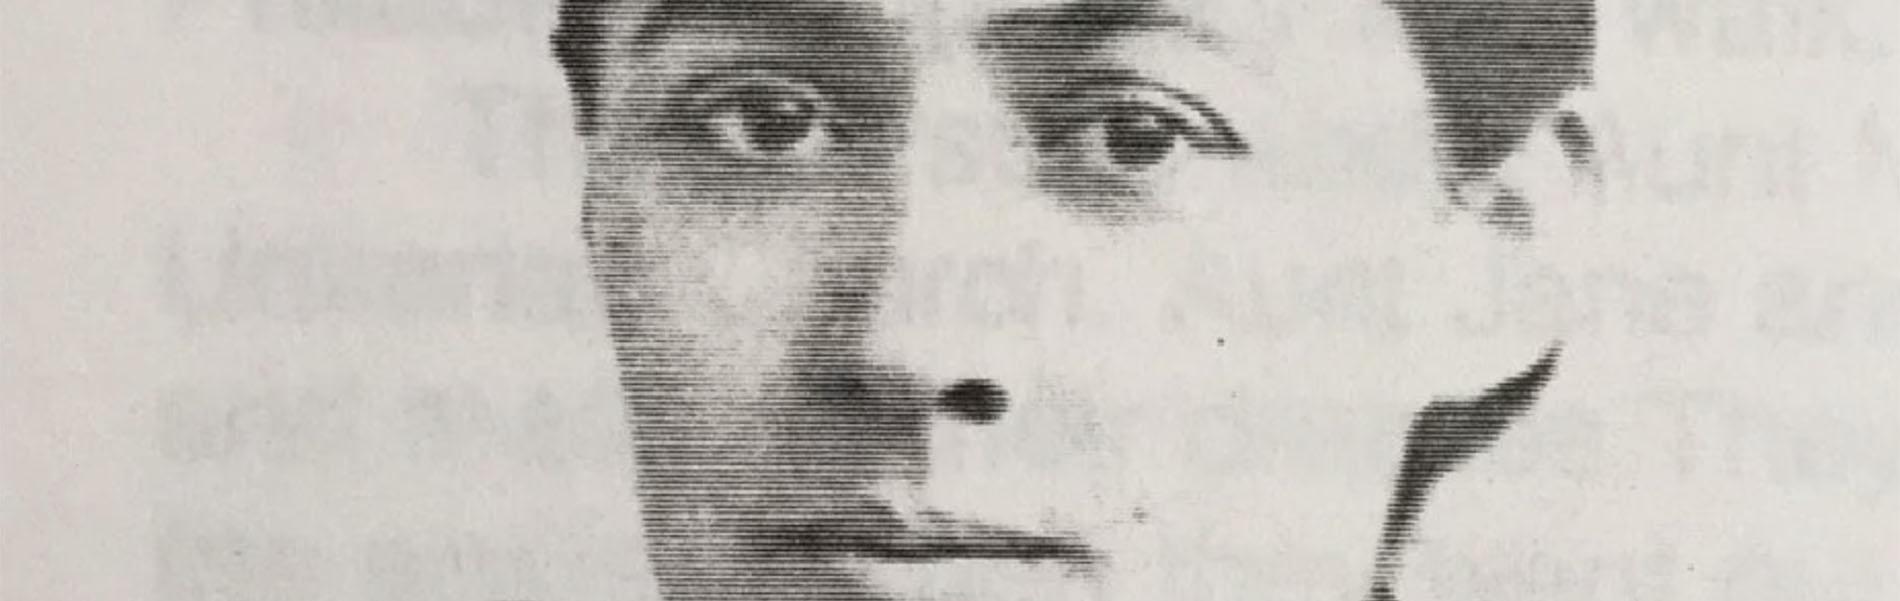 Minerva Parker Nichols at middle age